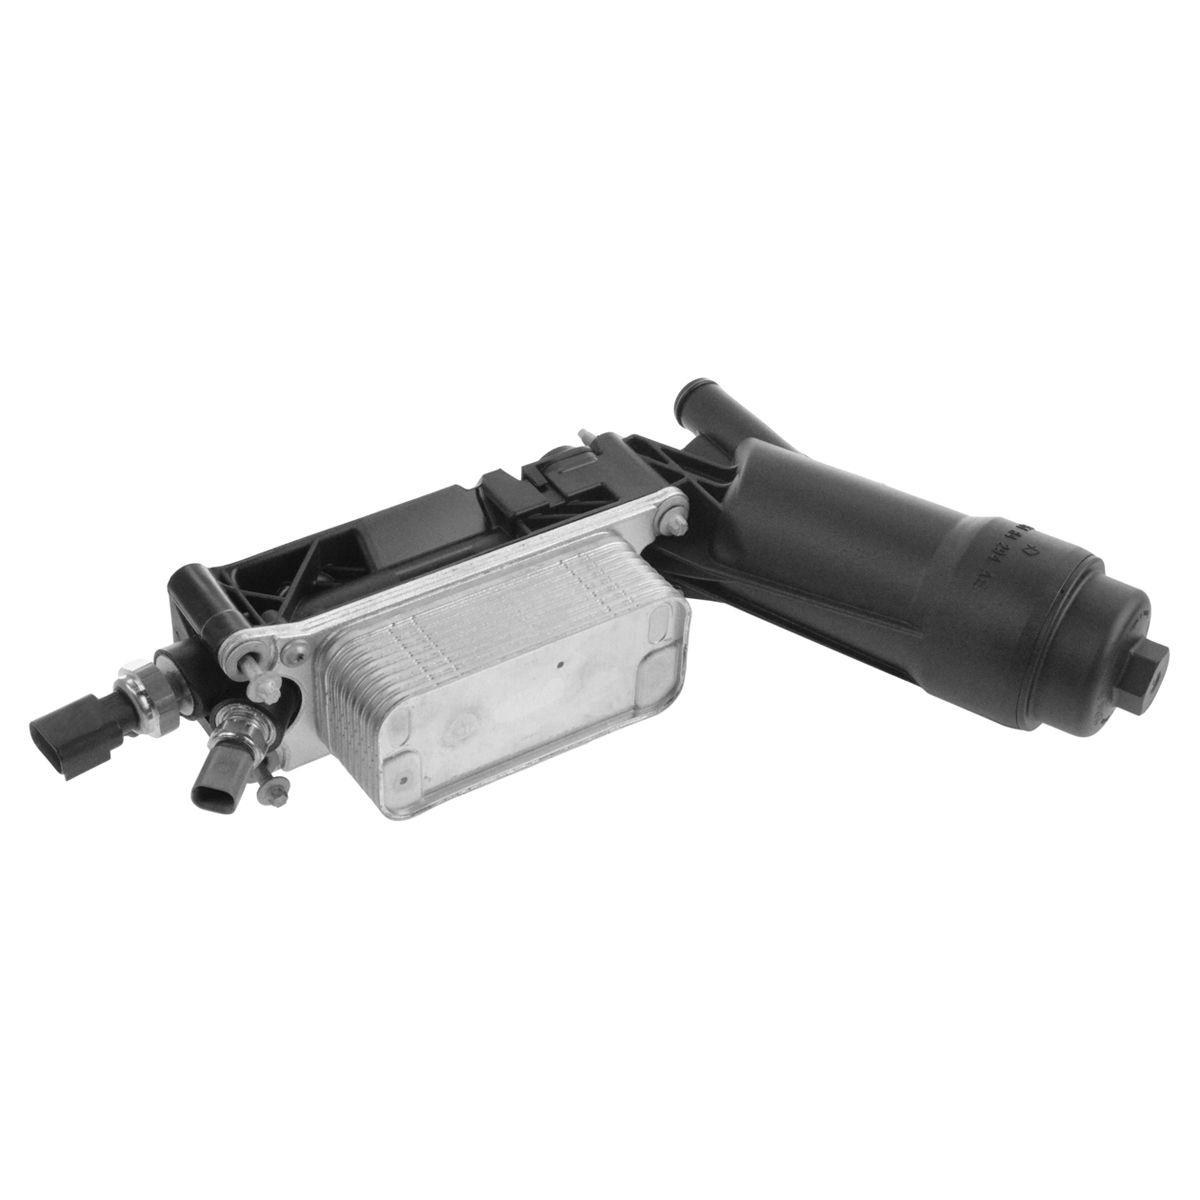 OEM 5184294AE Oil Filter Housing & Cooler Assembly For